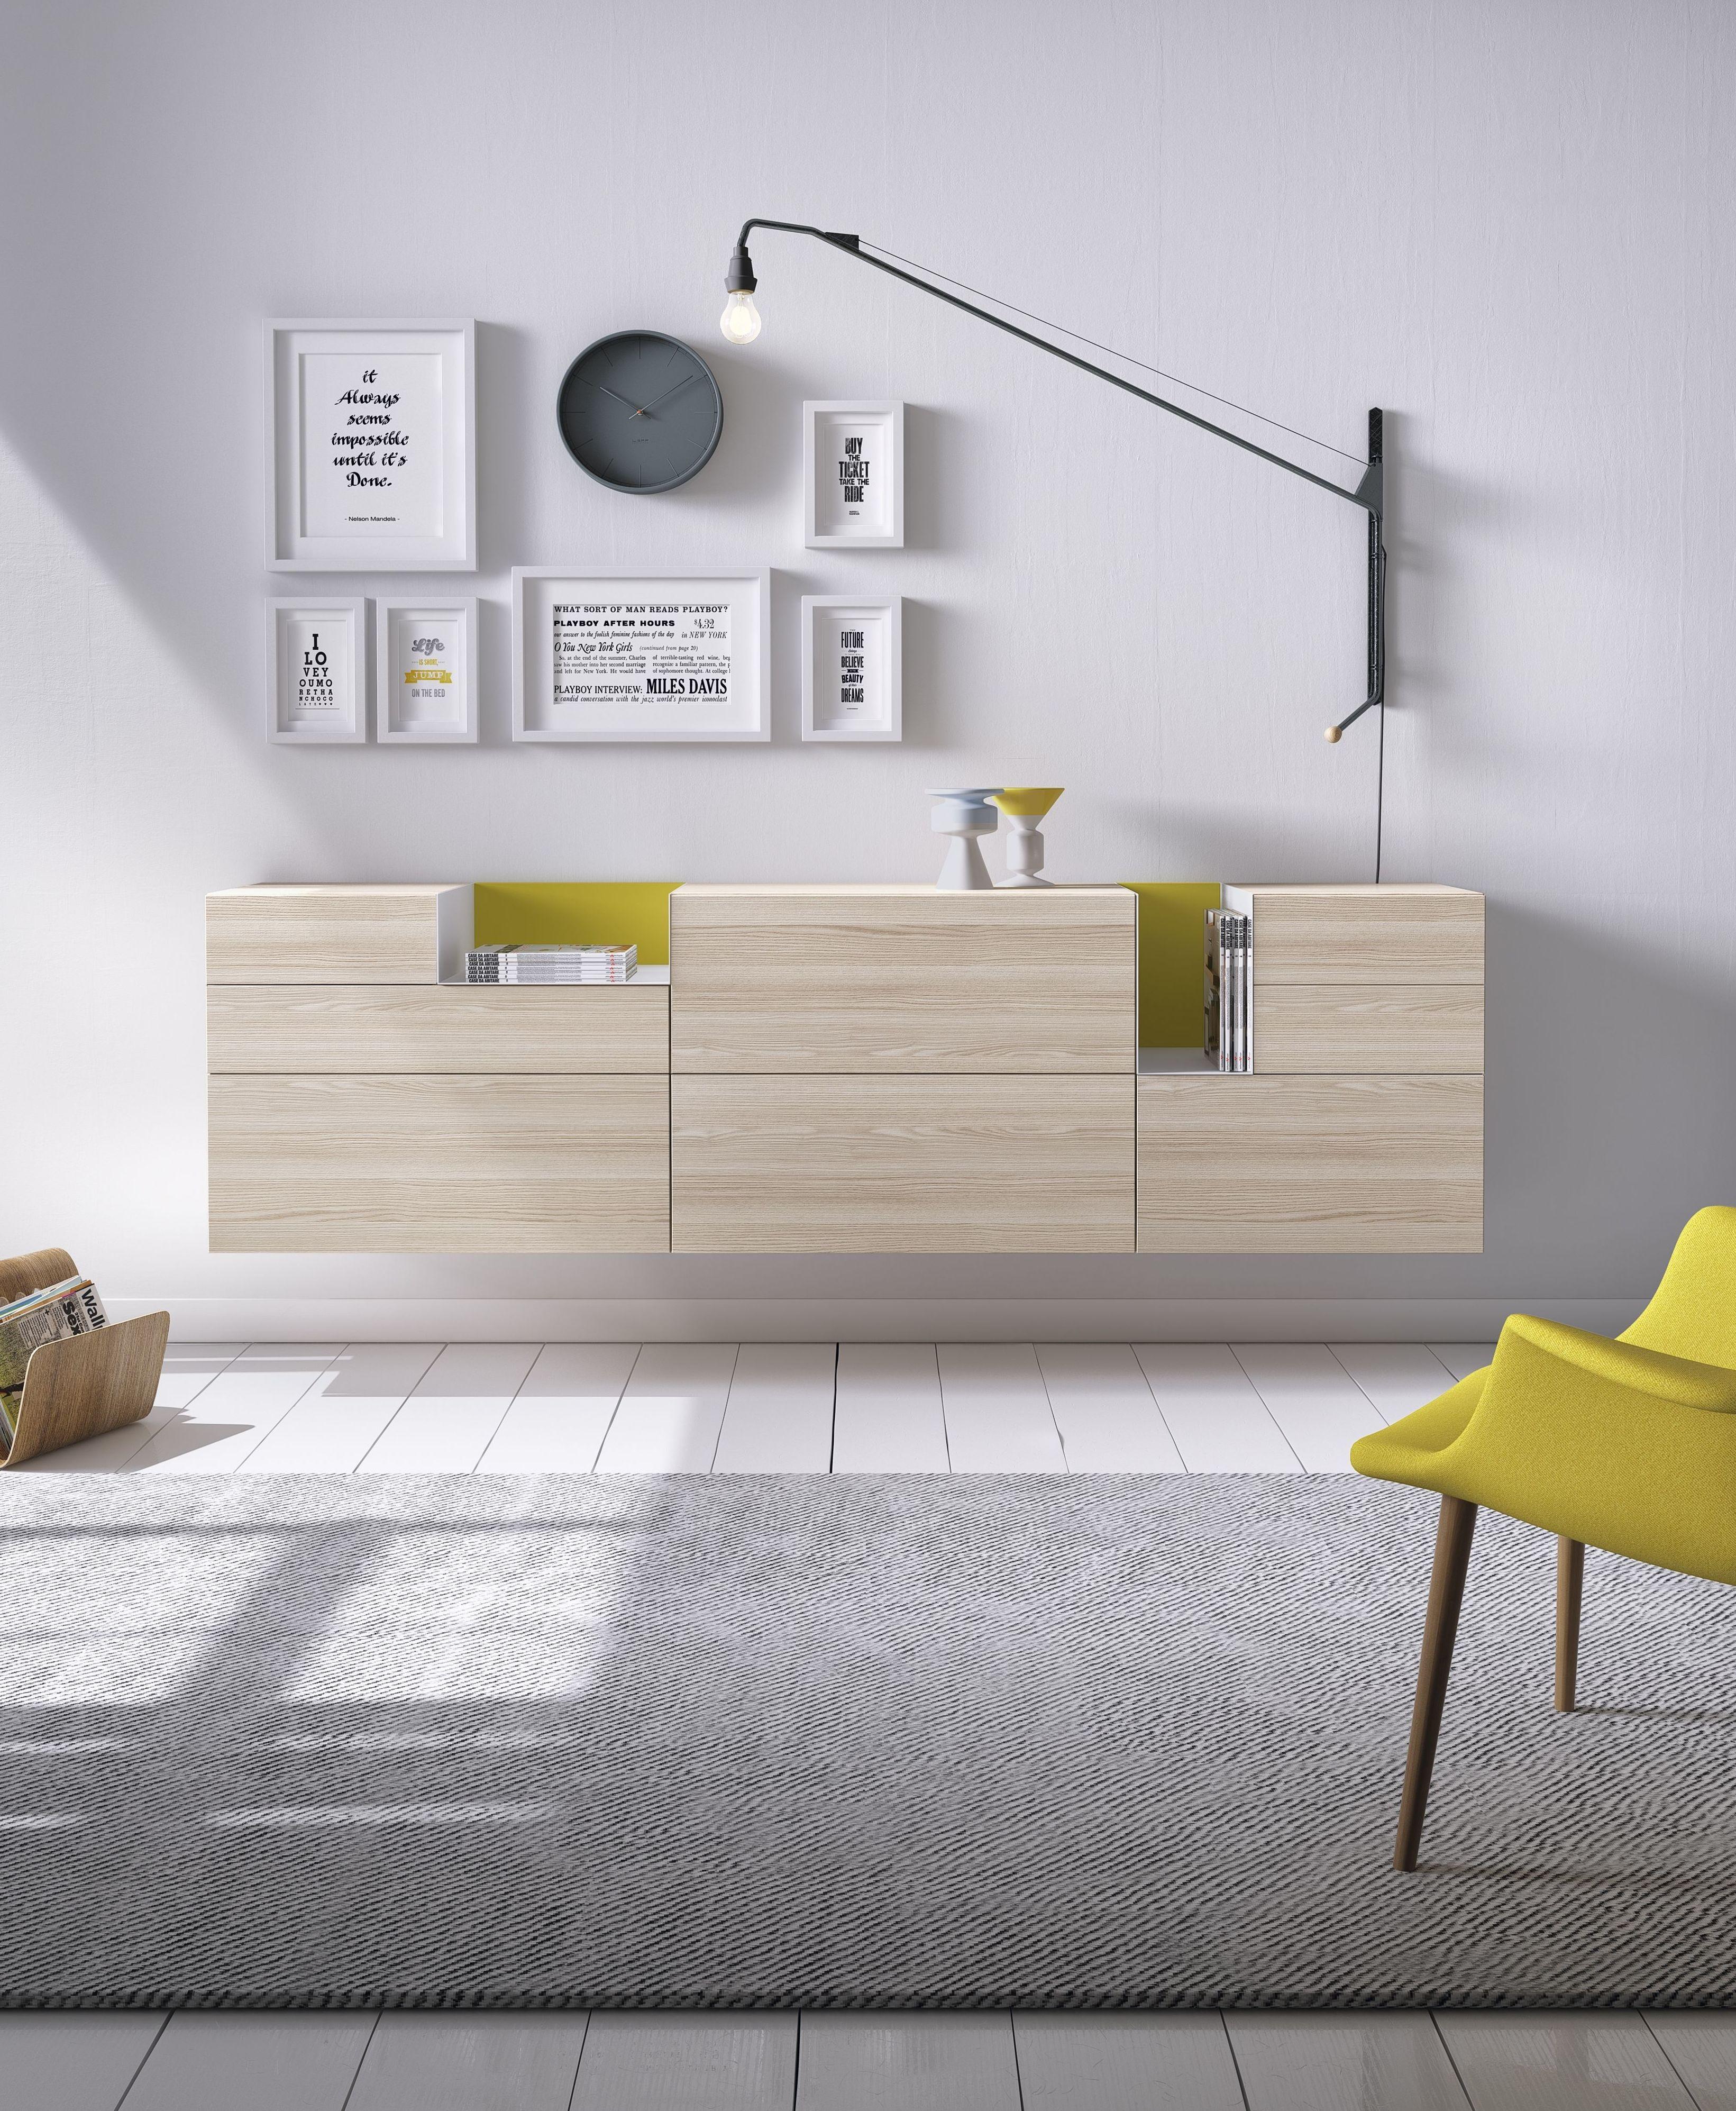 Foto 5 de Muebles en Getafe | Goga Muebles & Complementos